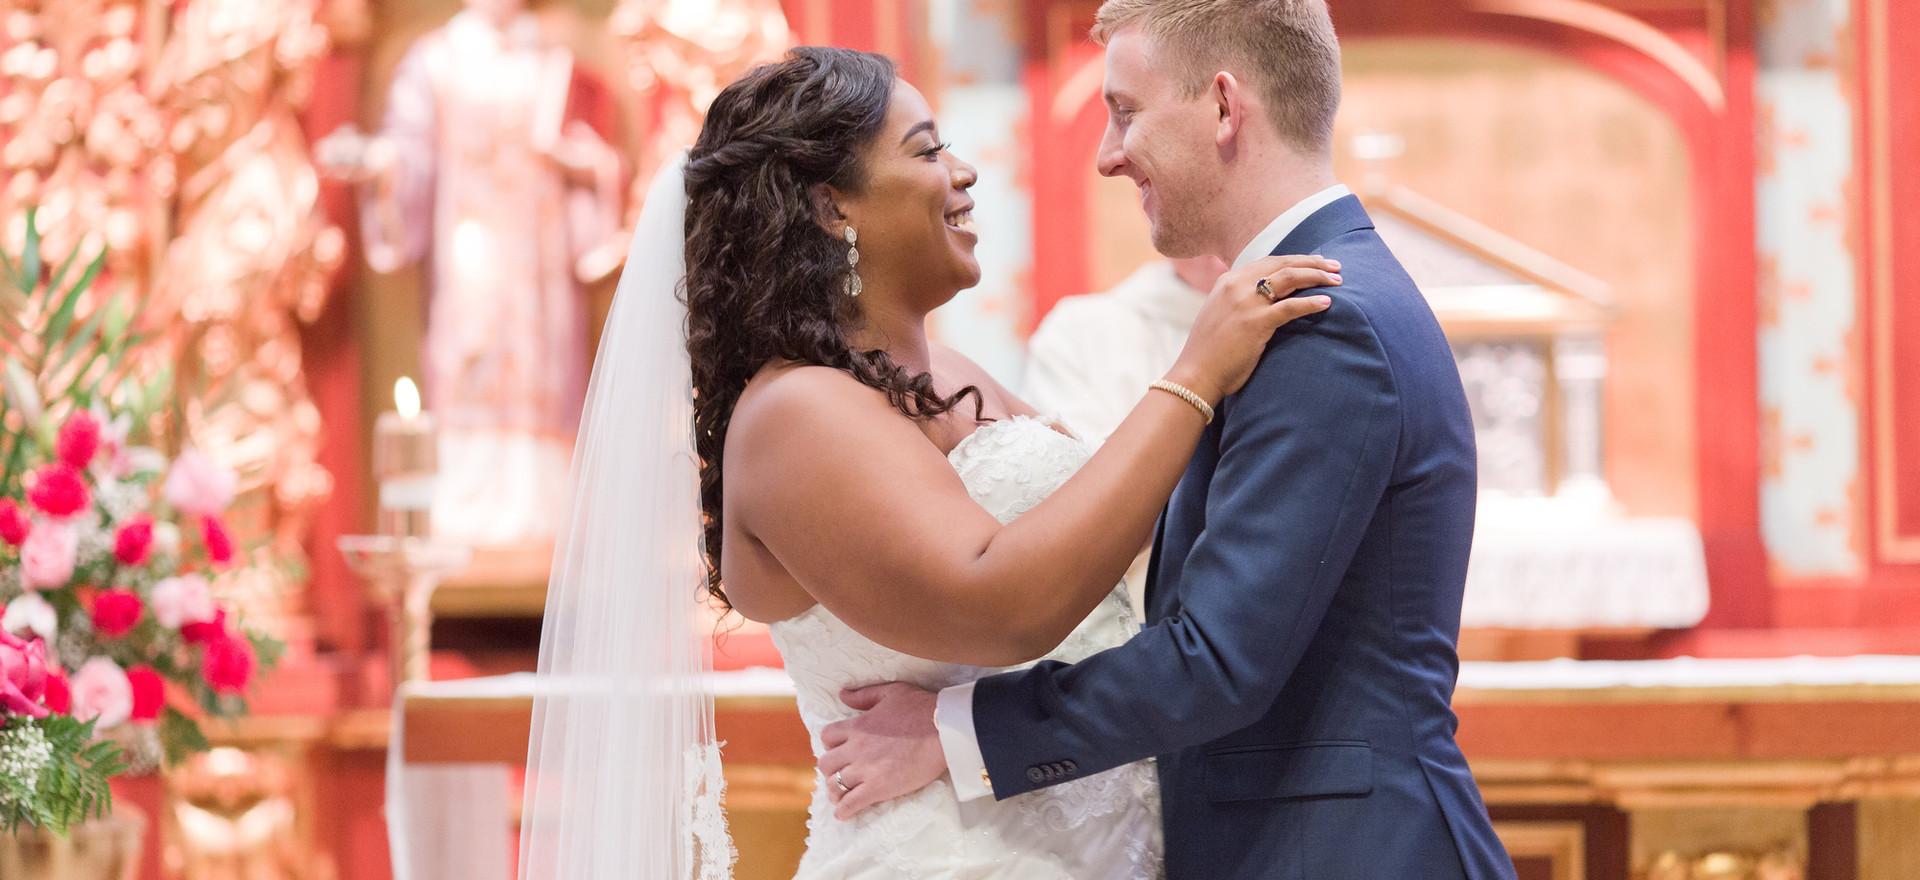 dallas wedding engagement proposal planning tina dannel bride groom celebration